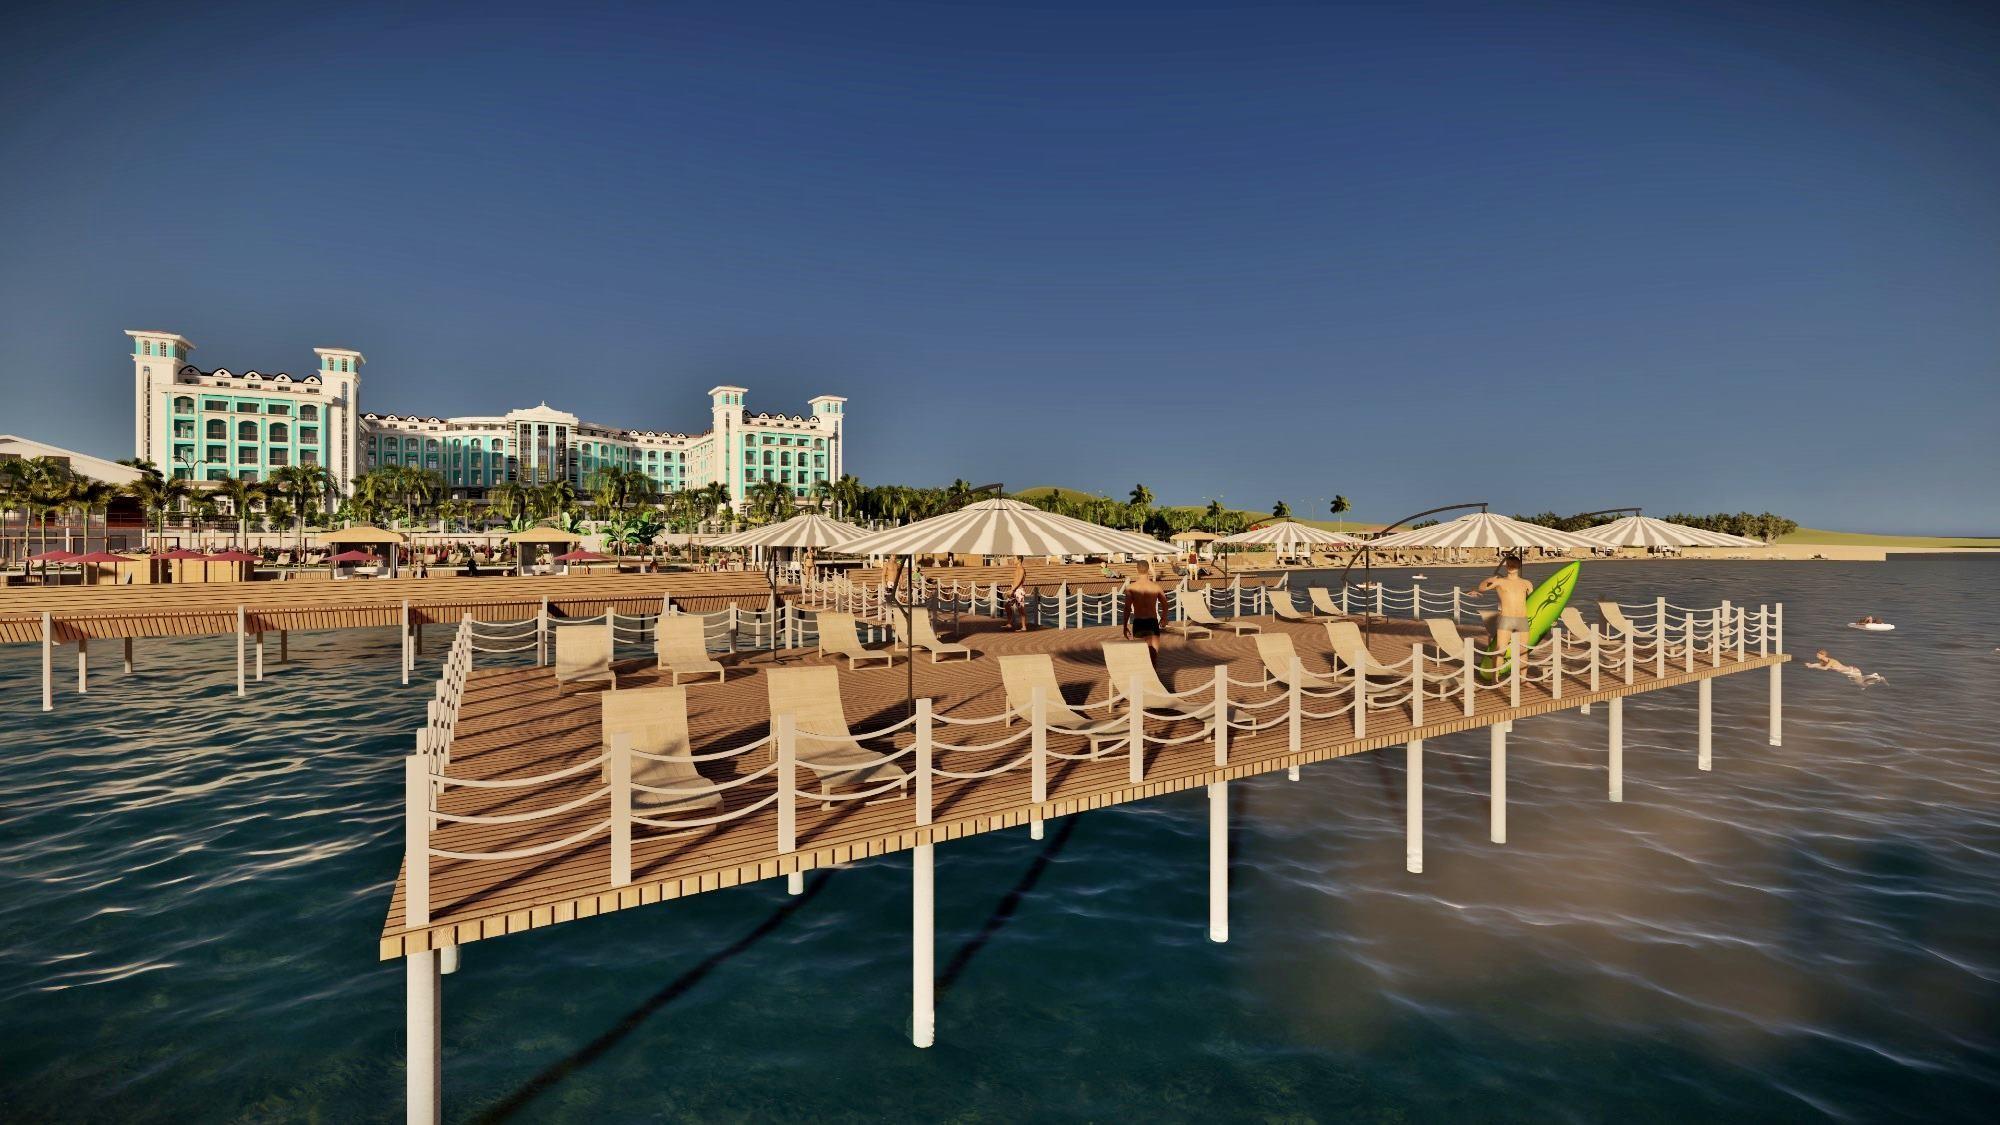 Maxeria Blue Didyma - плаж, платформа